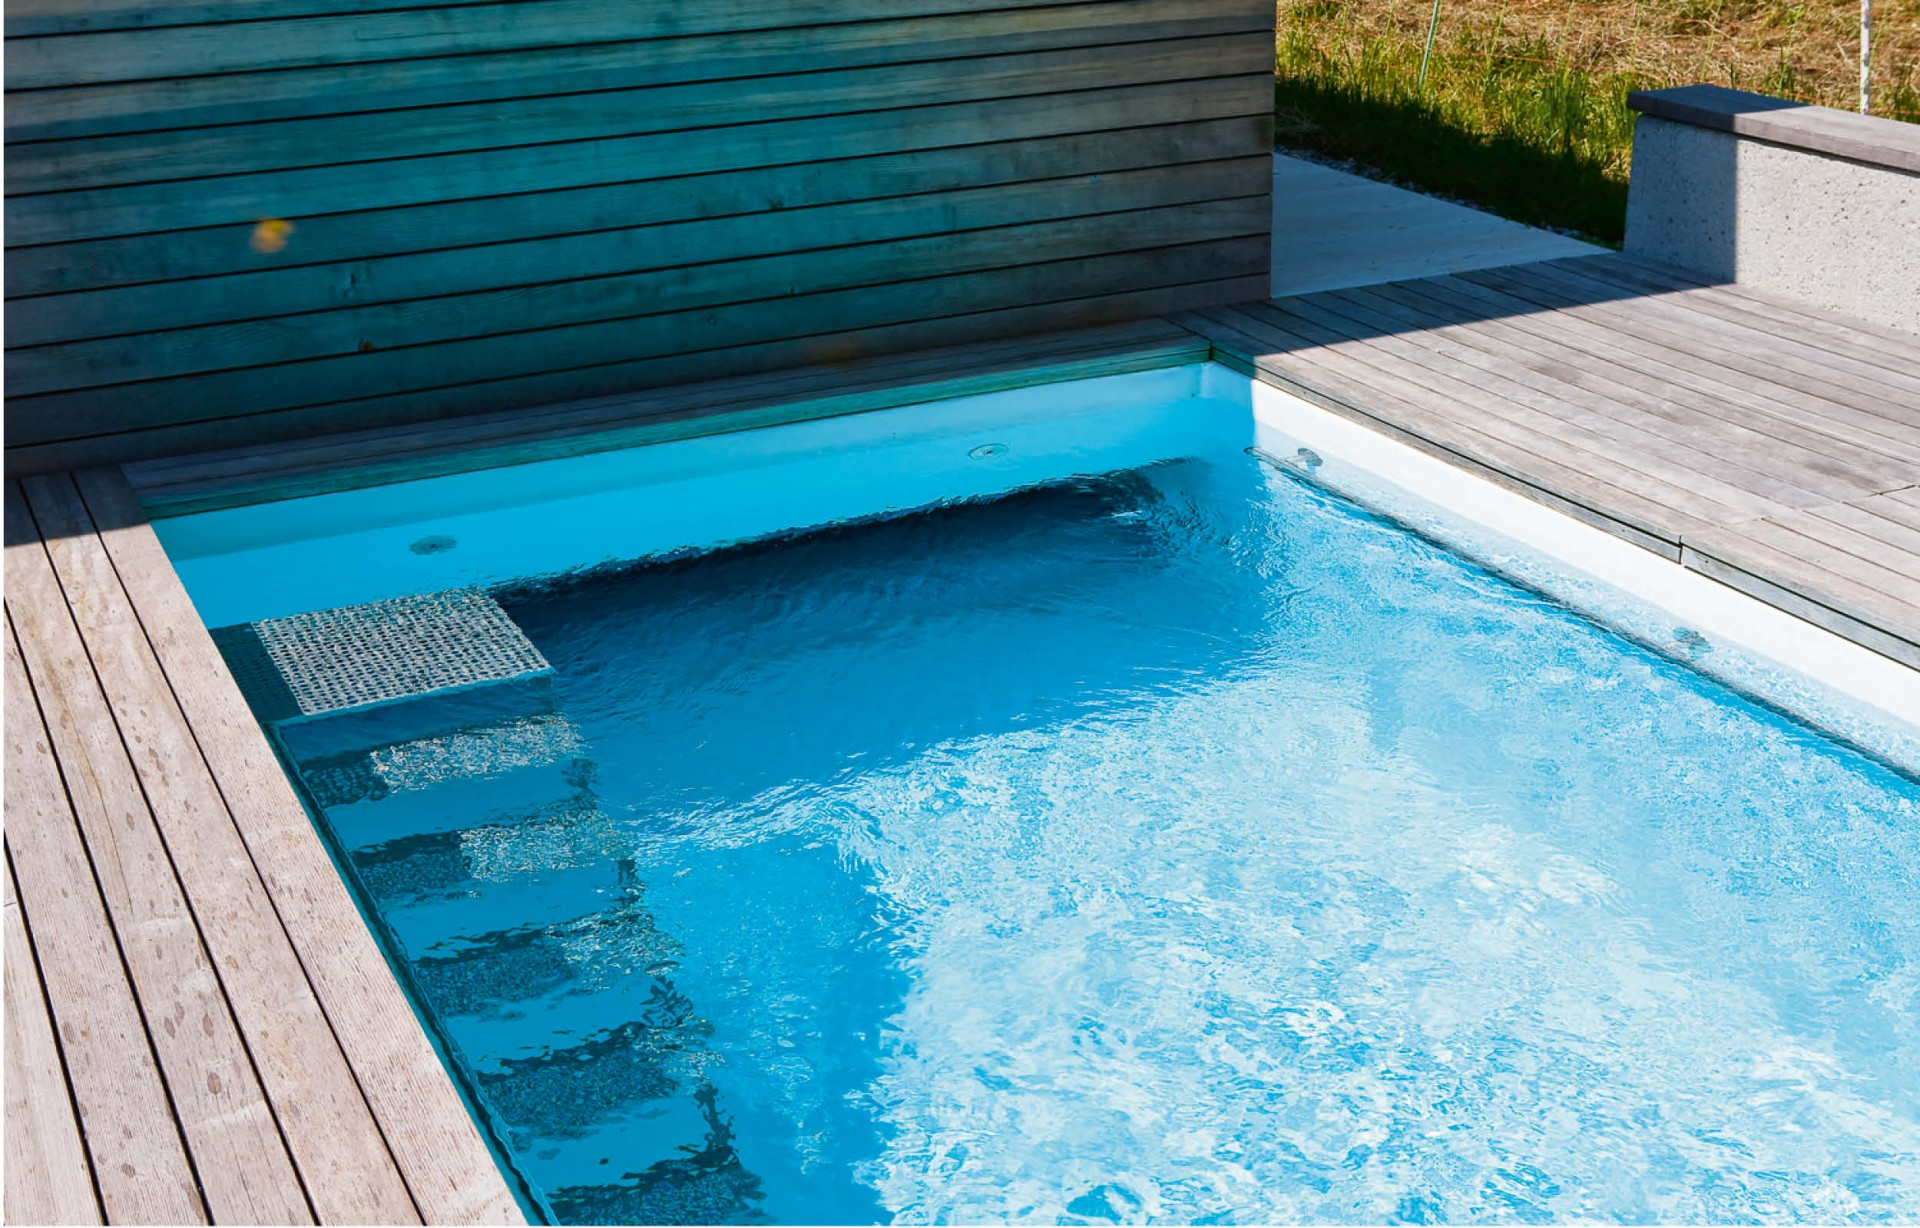 Pools_2500x1600_KL4